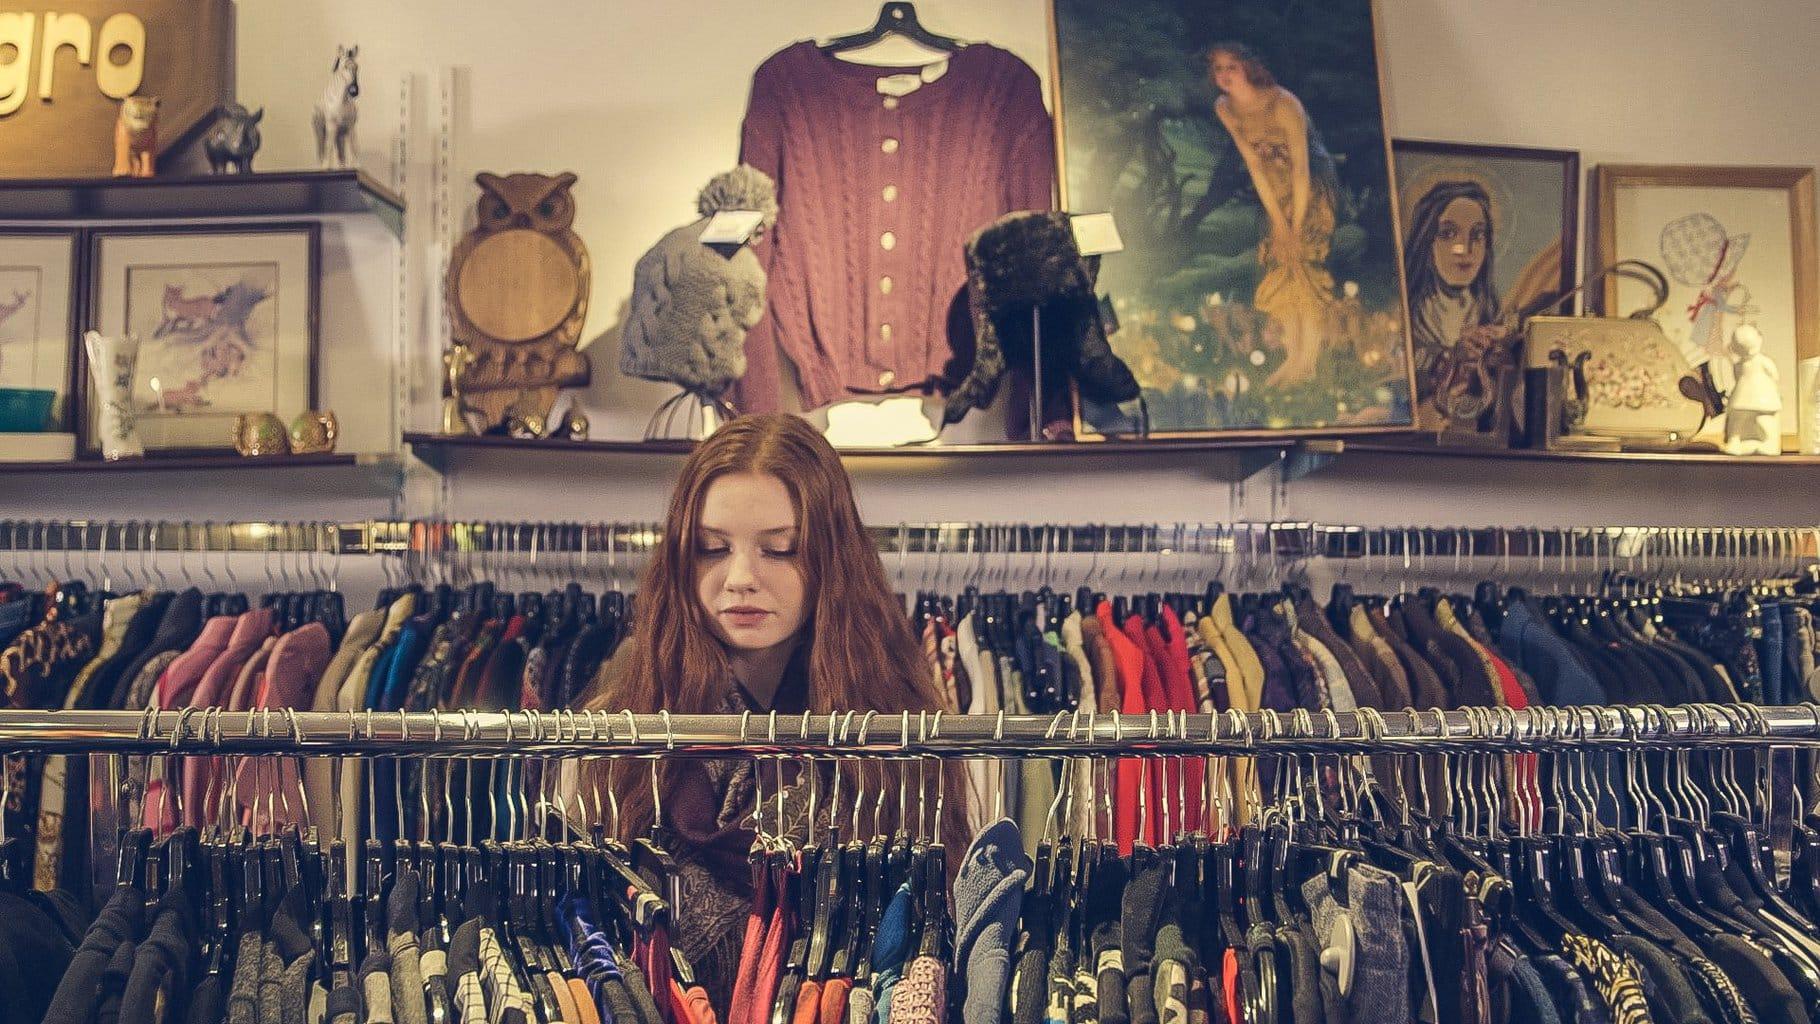 Girl looking through racks of clothing.